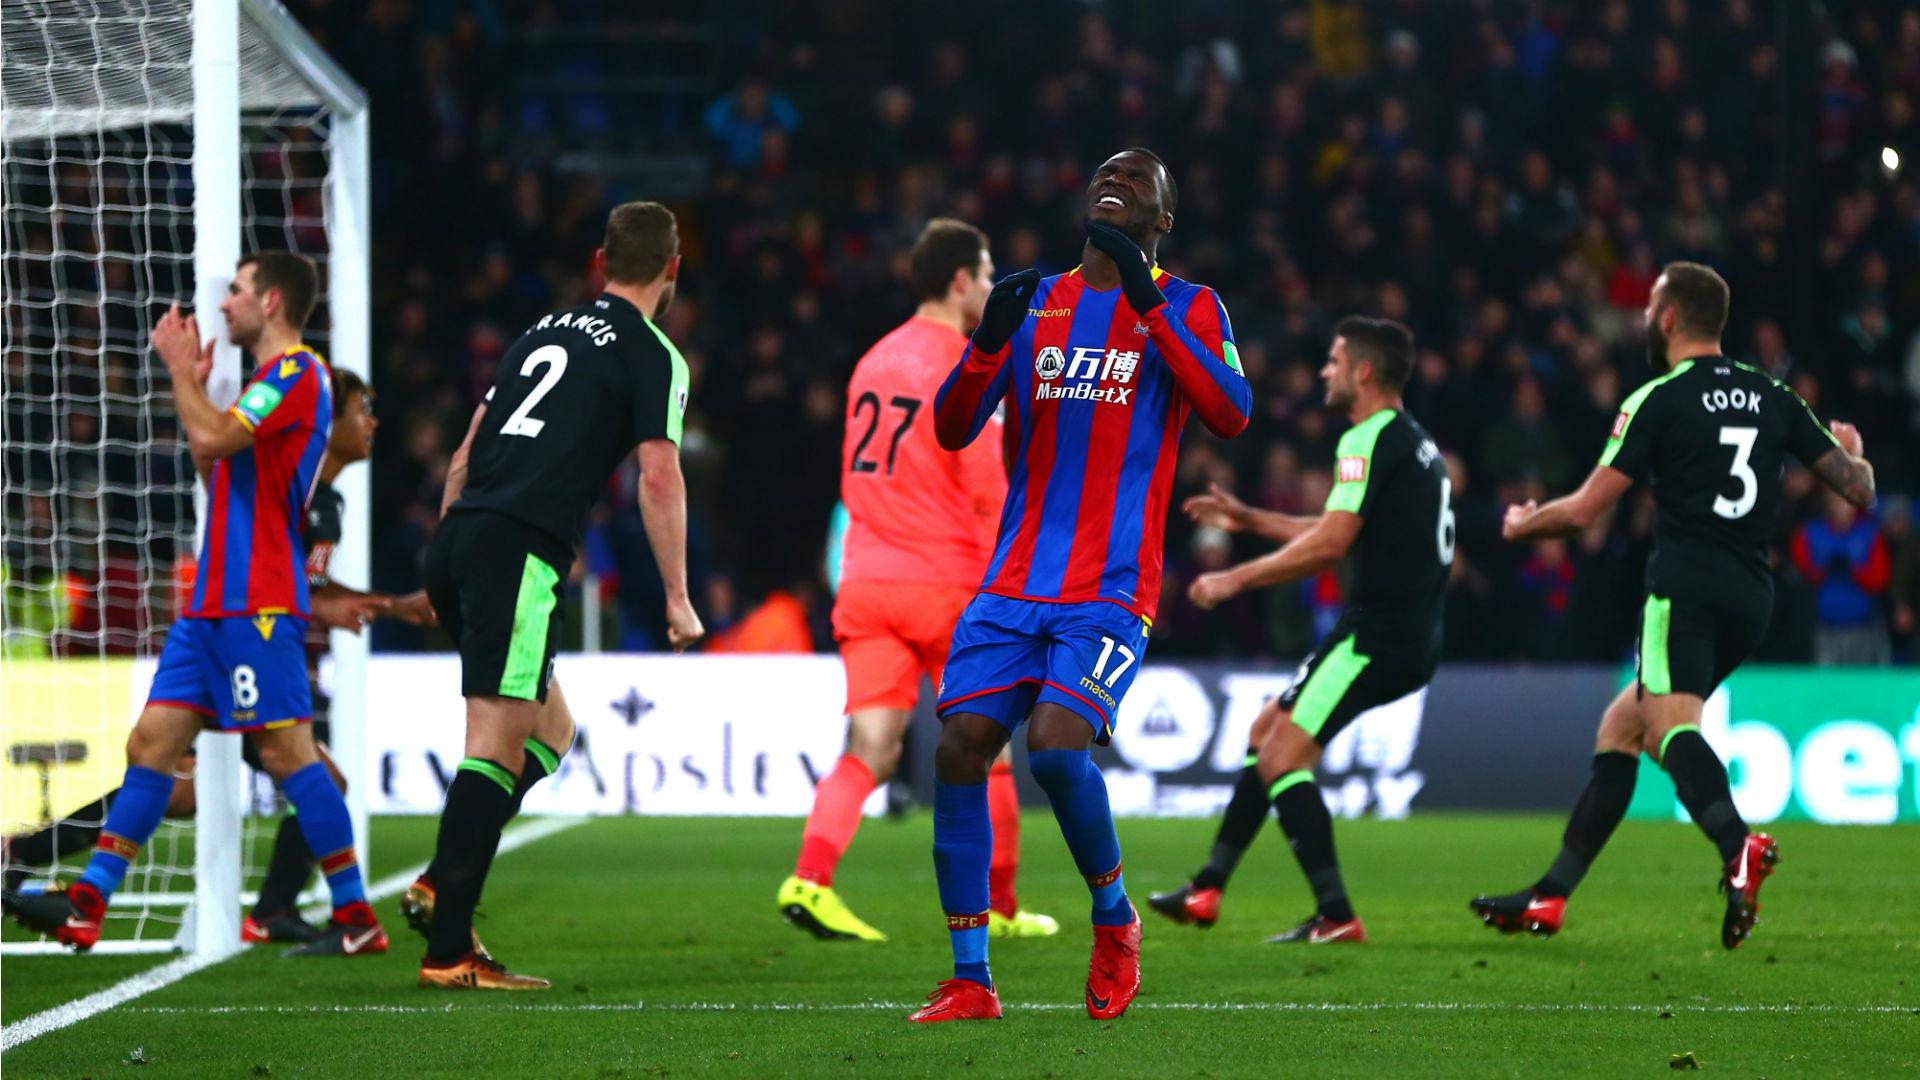 Superb Defoe equaliser gives Bournemouth draw at Palace